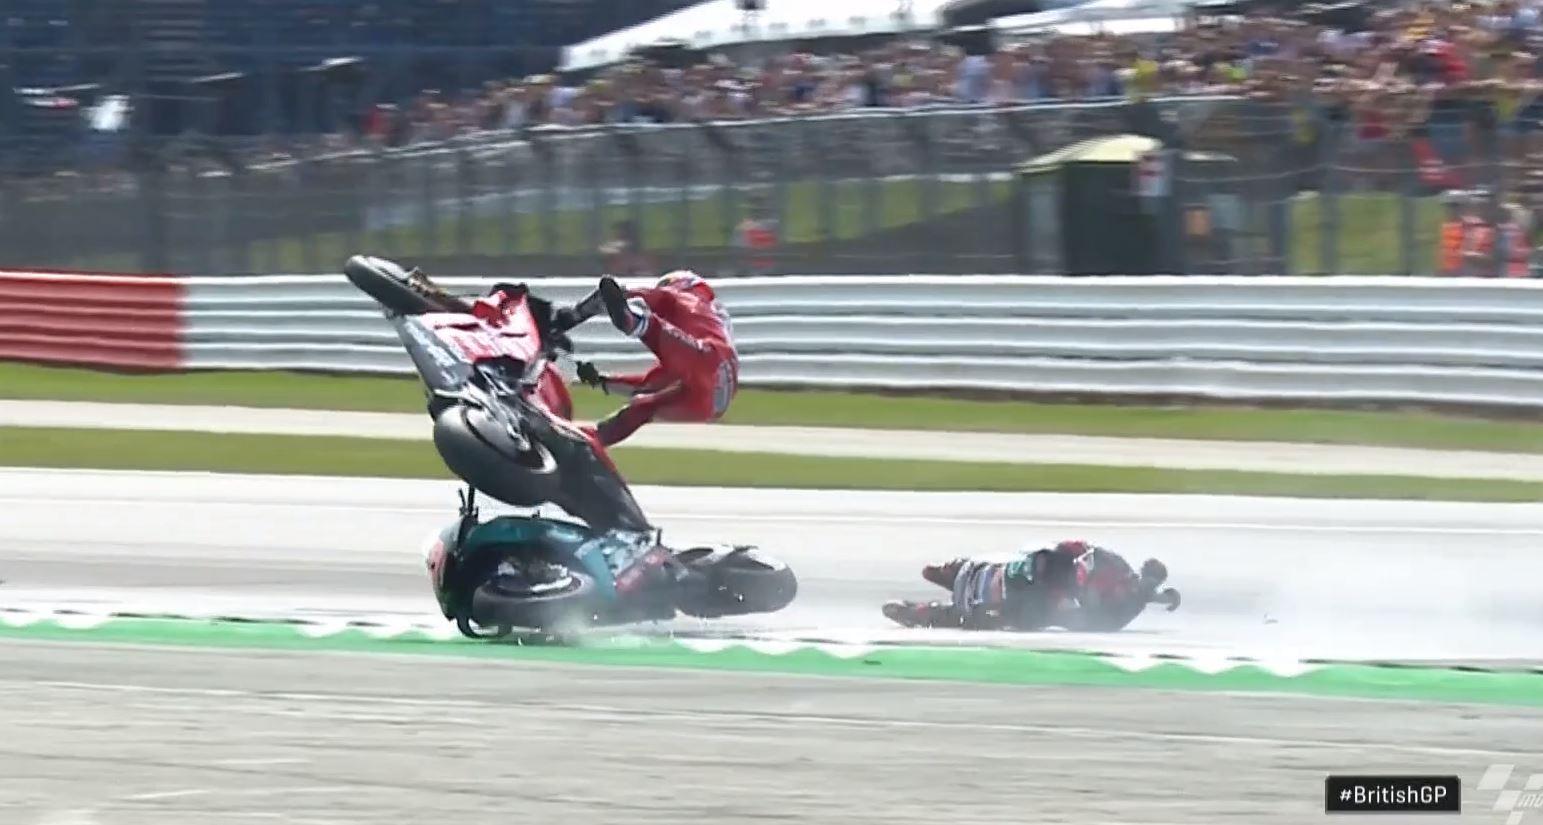 L'impressionnant crash entre Quartararo et Dovizioso